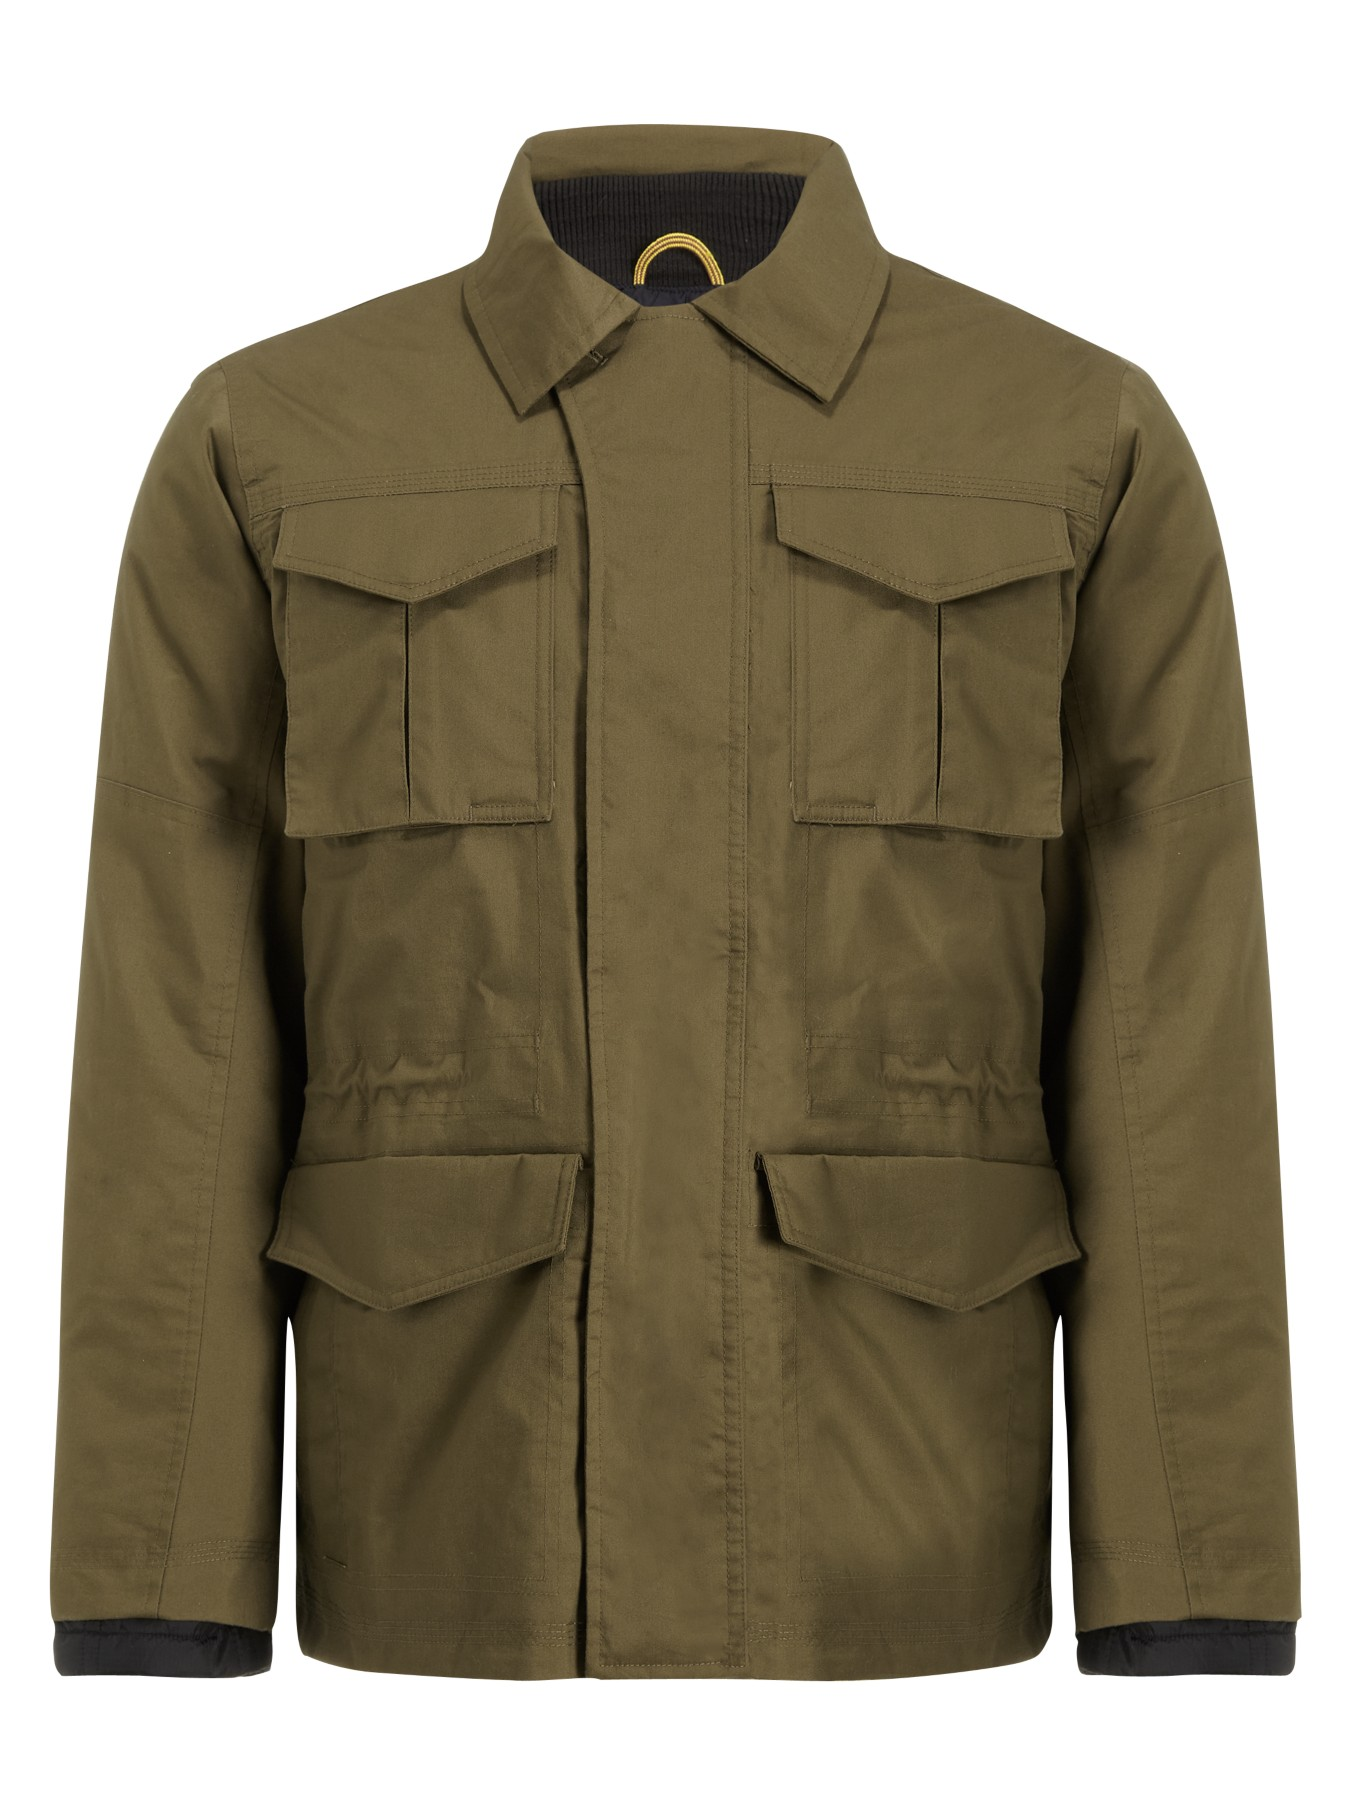 Sudor Cilios Religioso  Timberland Cotton Abington 3in1 Waterproof Field Jacket in Olive (Green)  for Men - Lyst